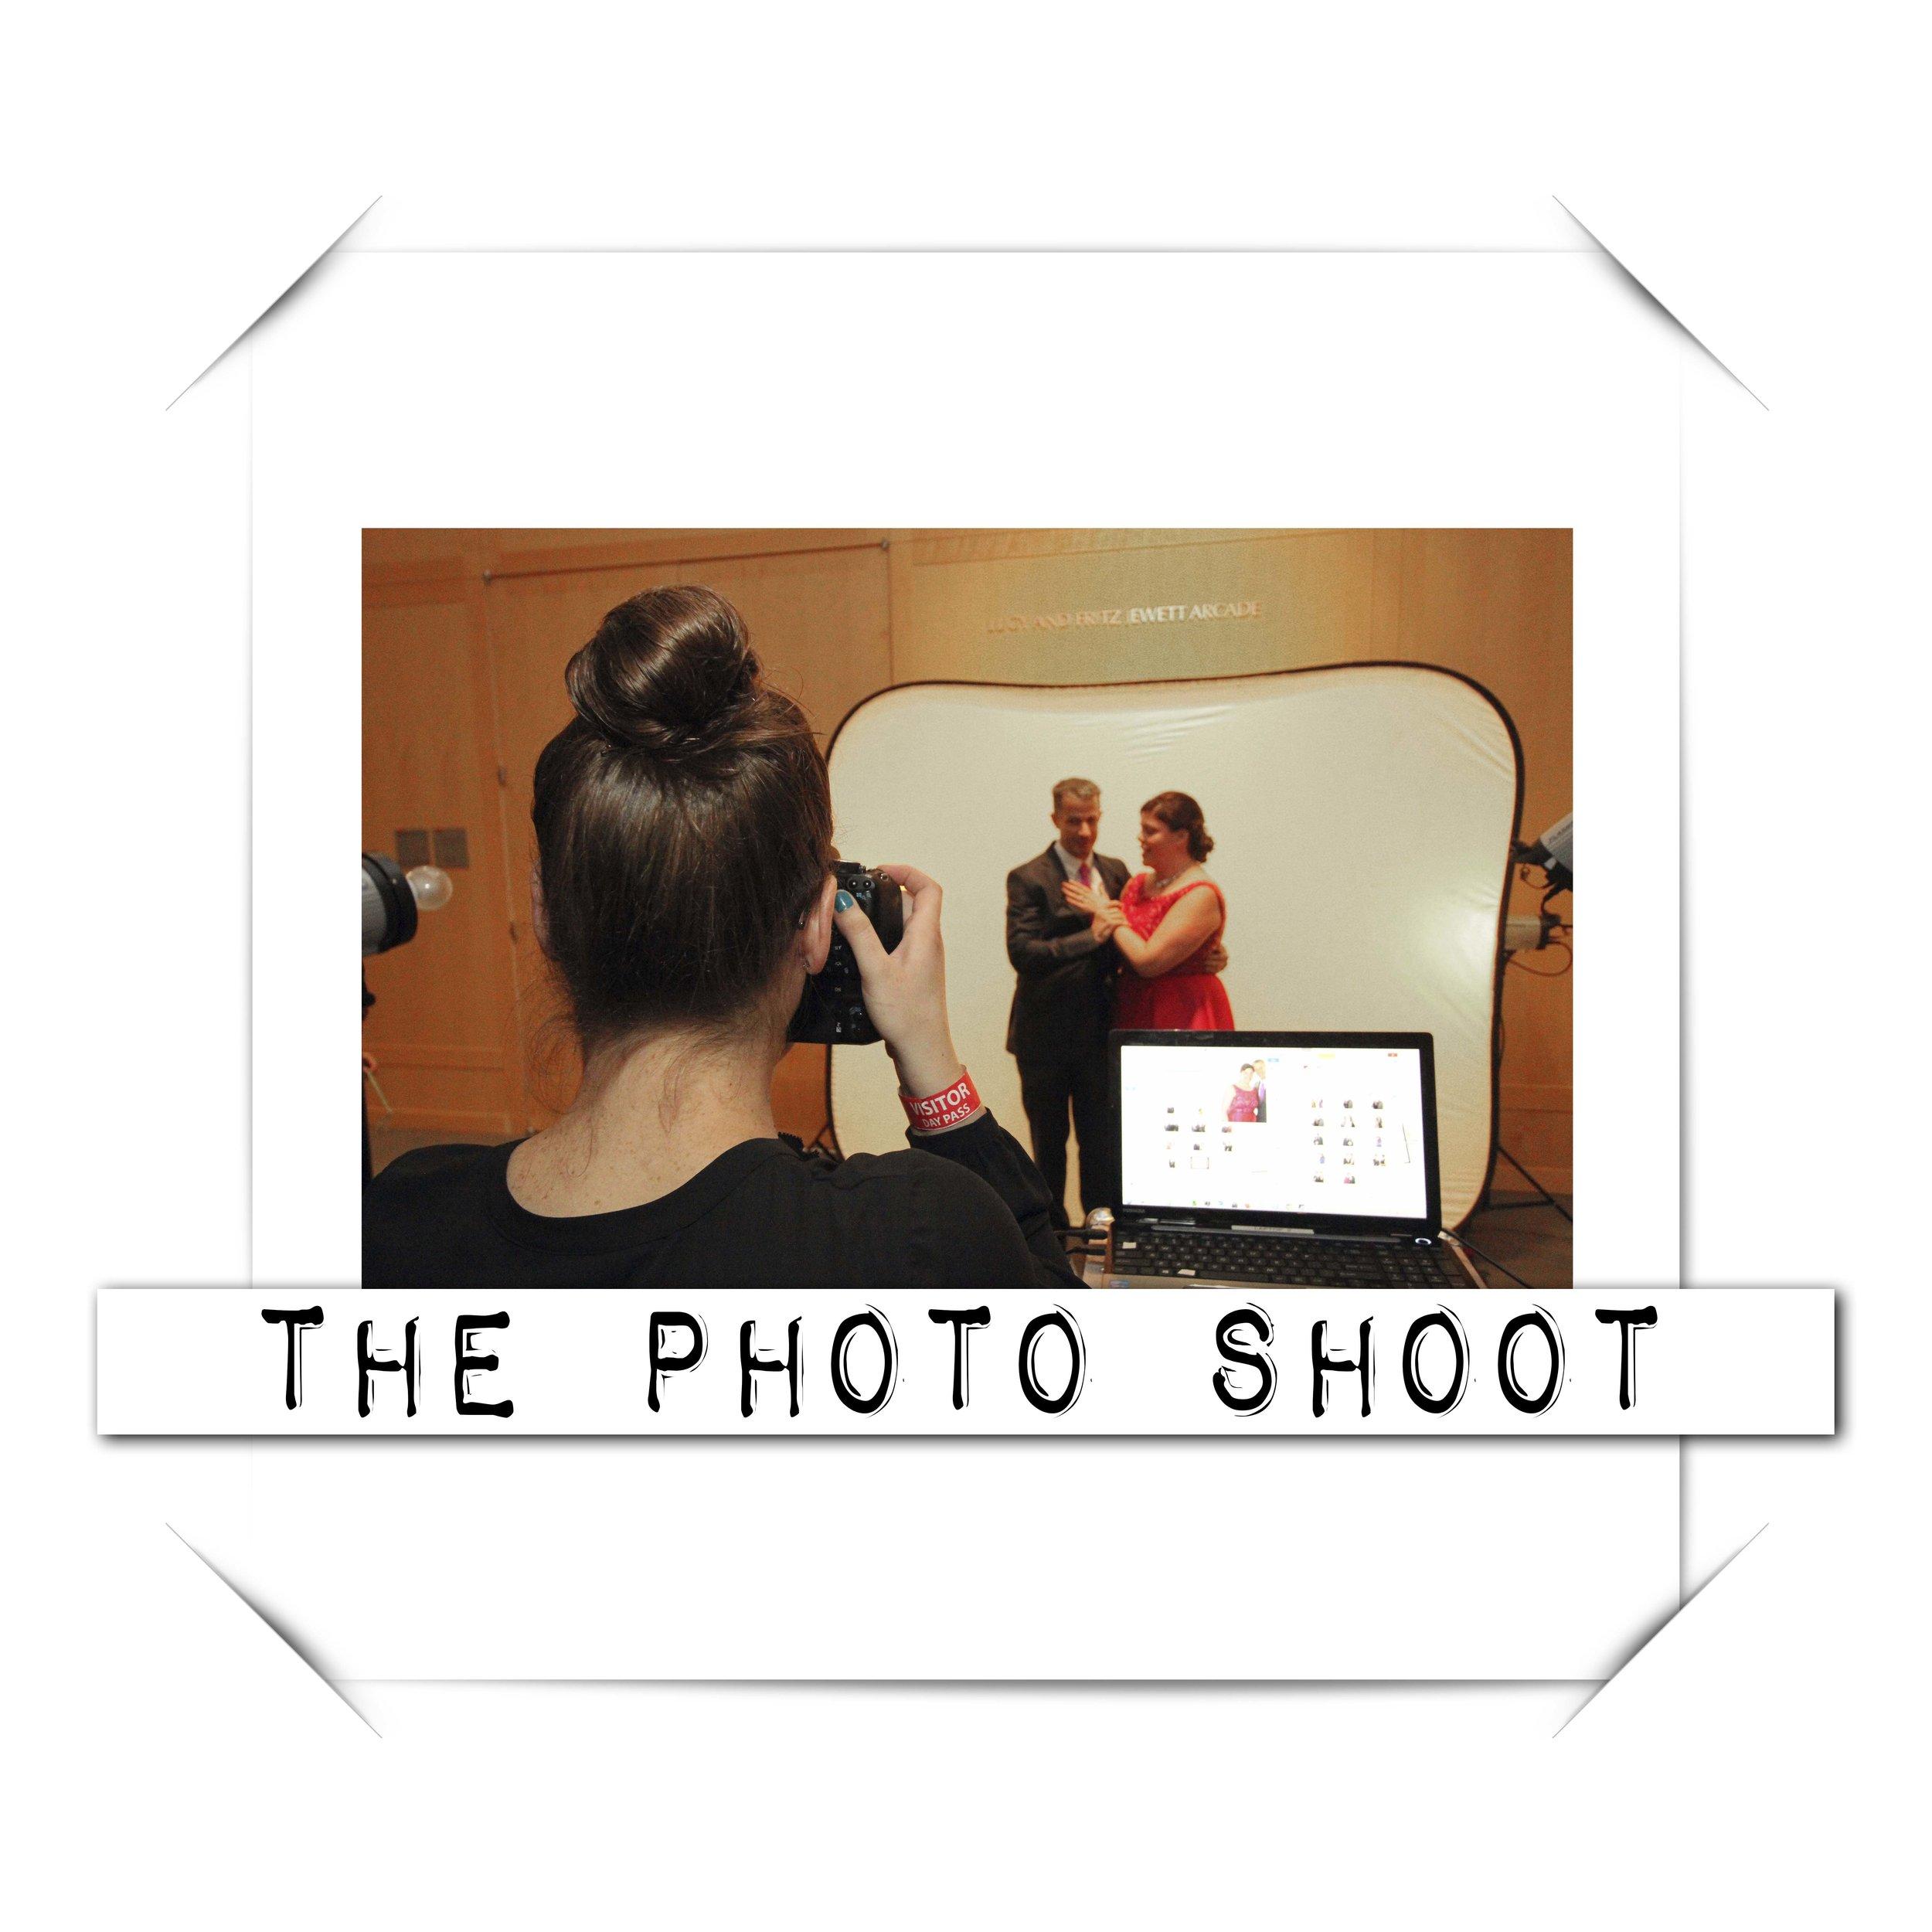 The_Photo_Shoot.jpg